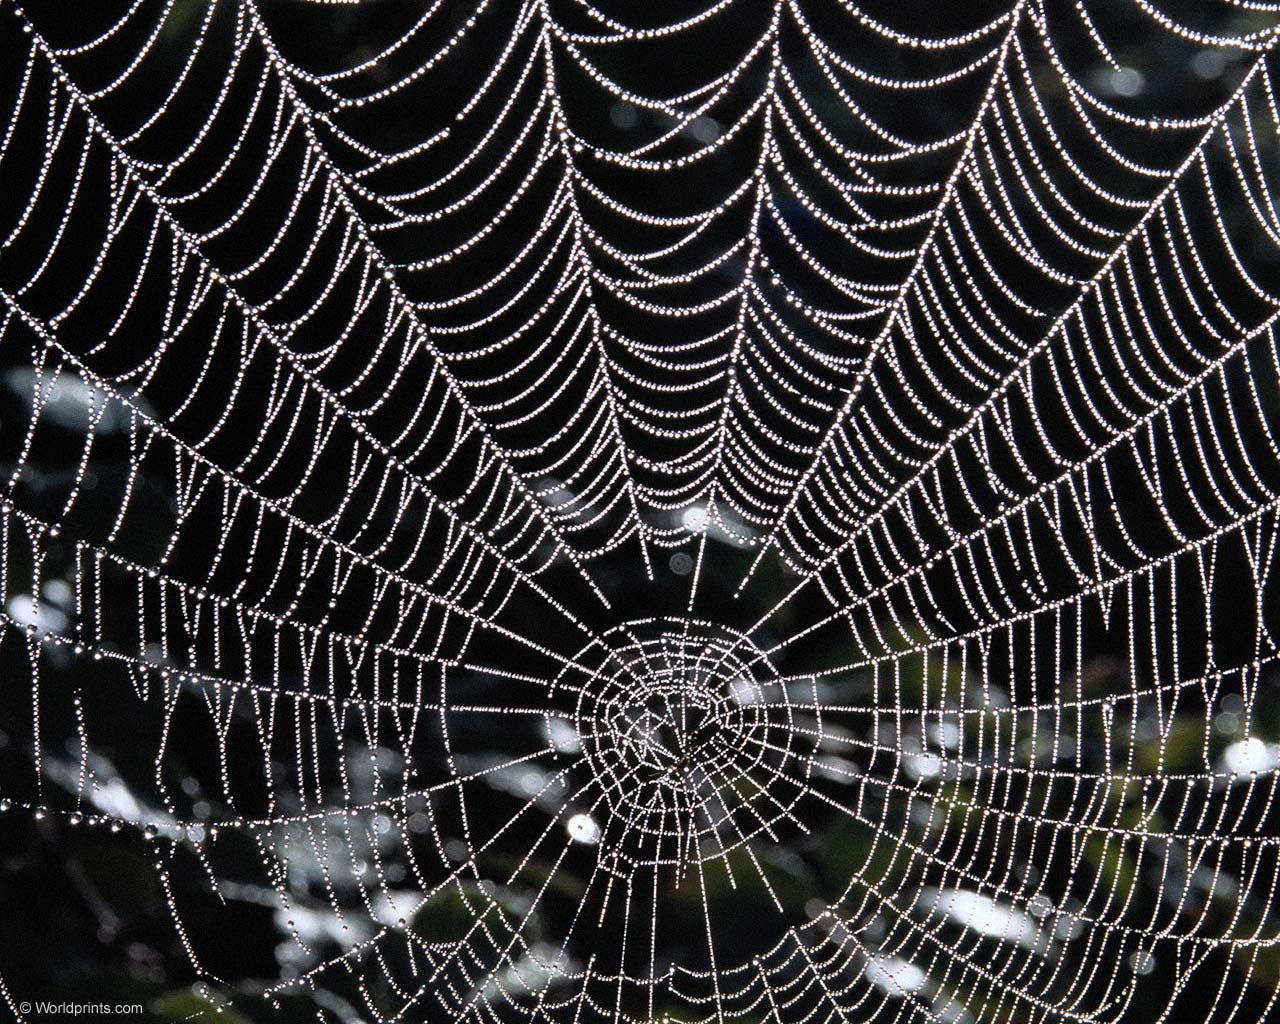 Spider web - Best wallpapers on your desktop: Animal